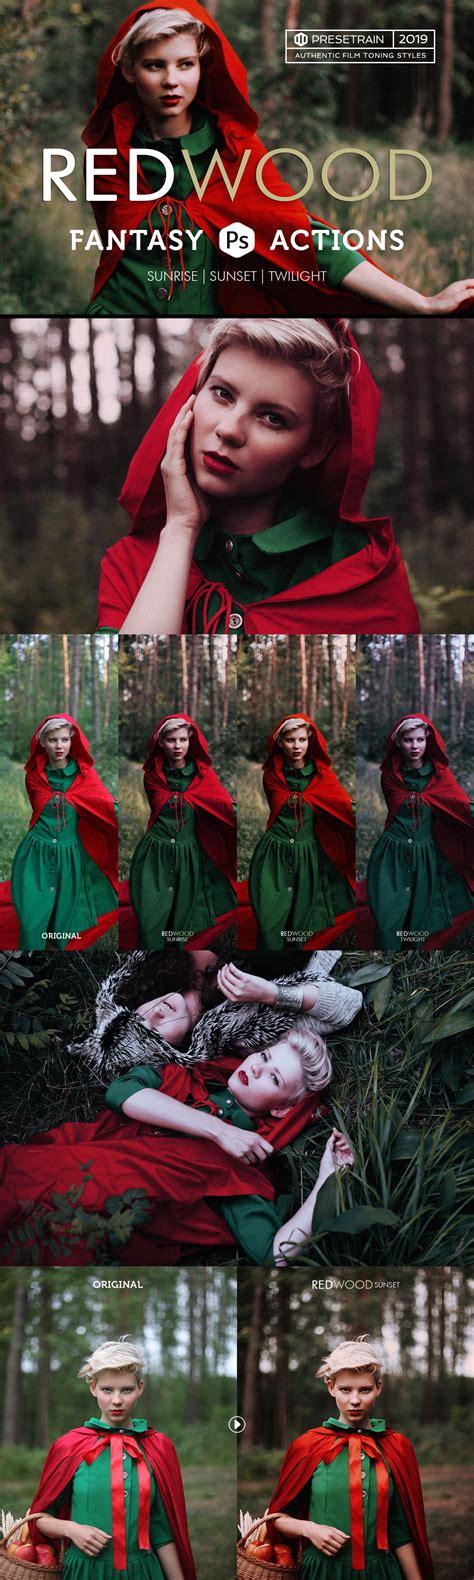 redwood photoshop actions photoshop add ons creative